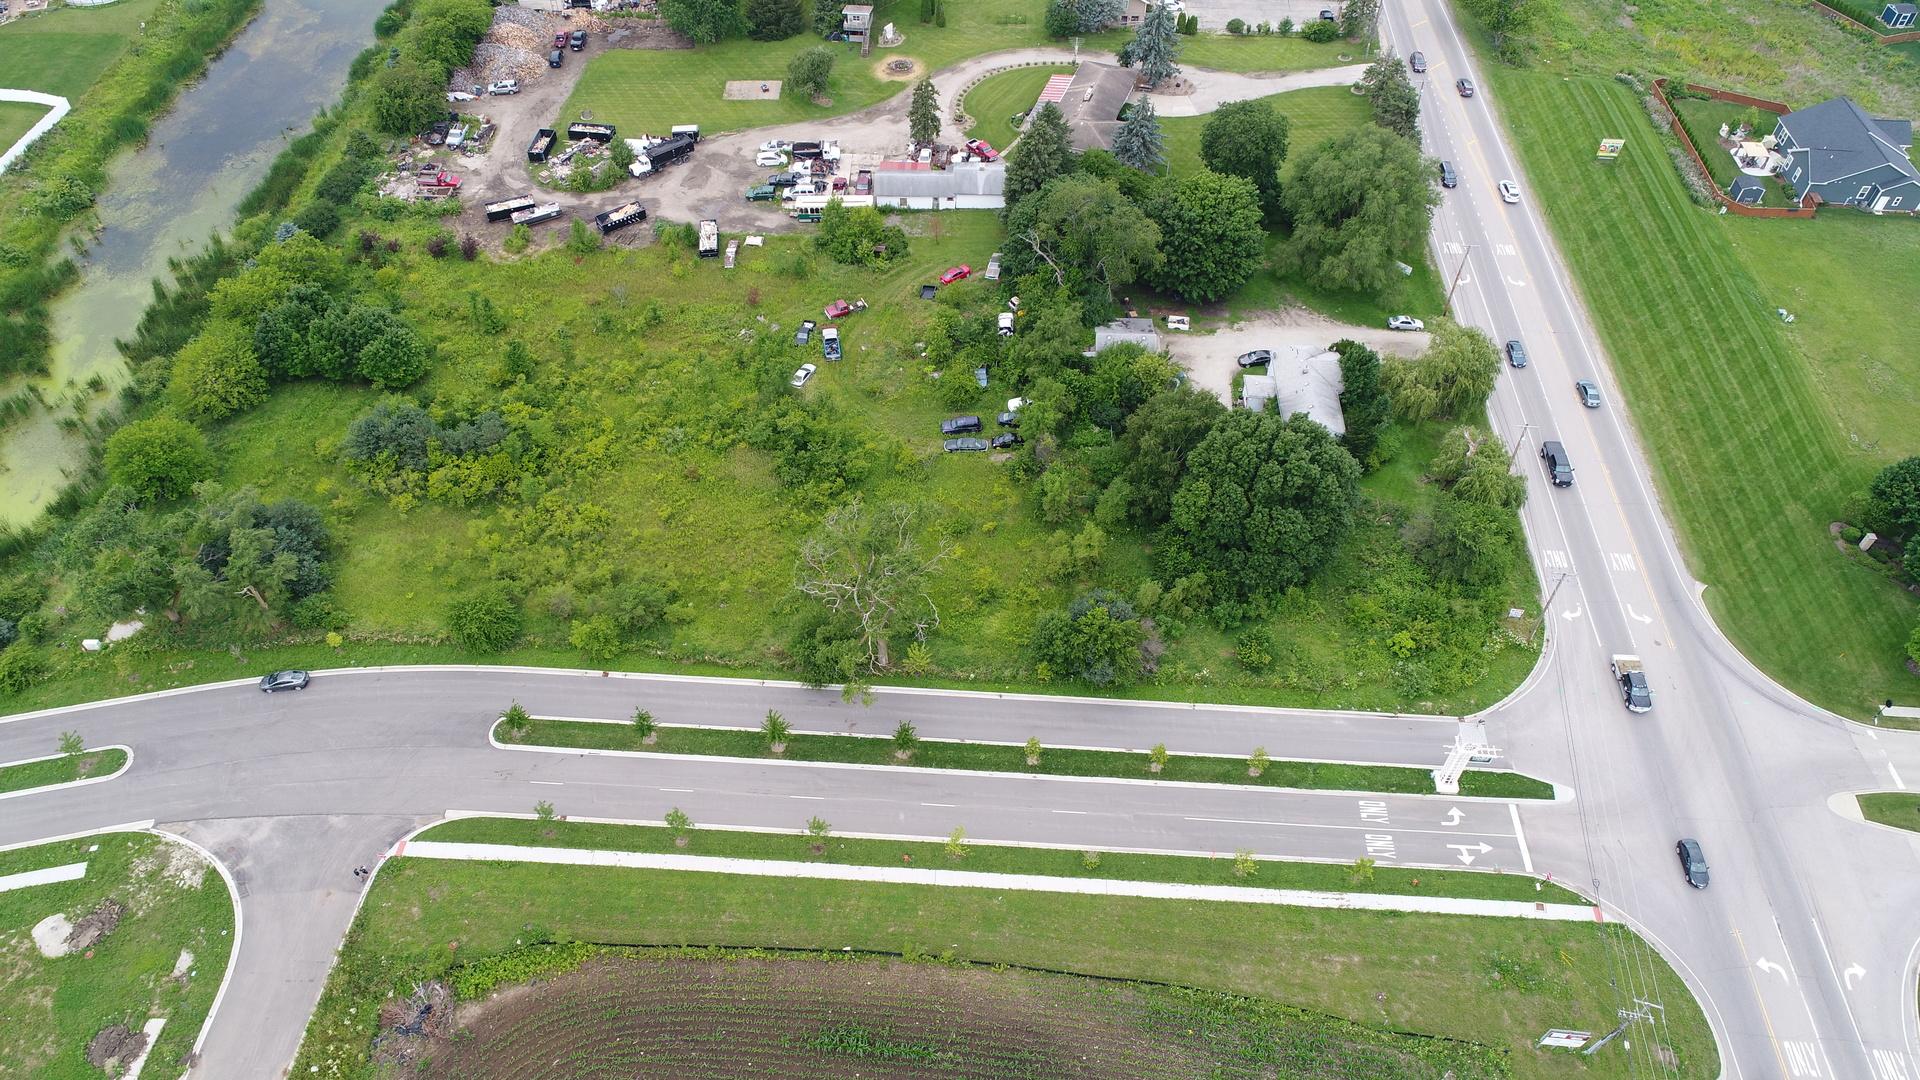 38W445 US HIGHWAY 20 Highway, Elgin, IL 60124